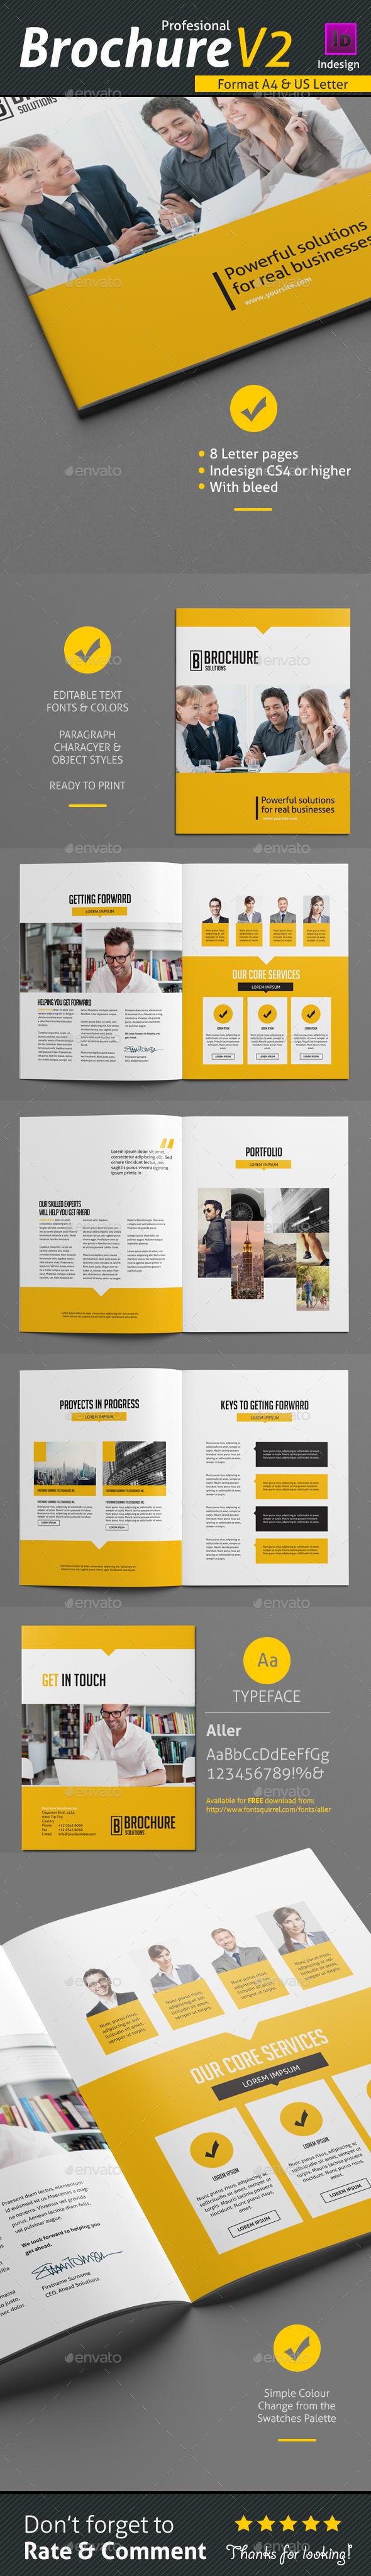 Brochure Template V2 - Brochures Print Templates